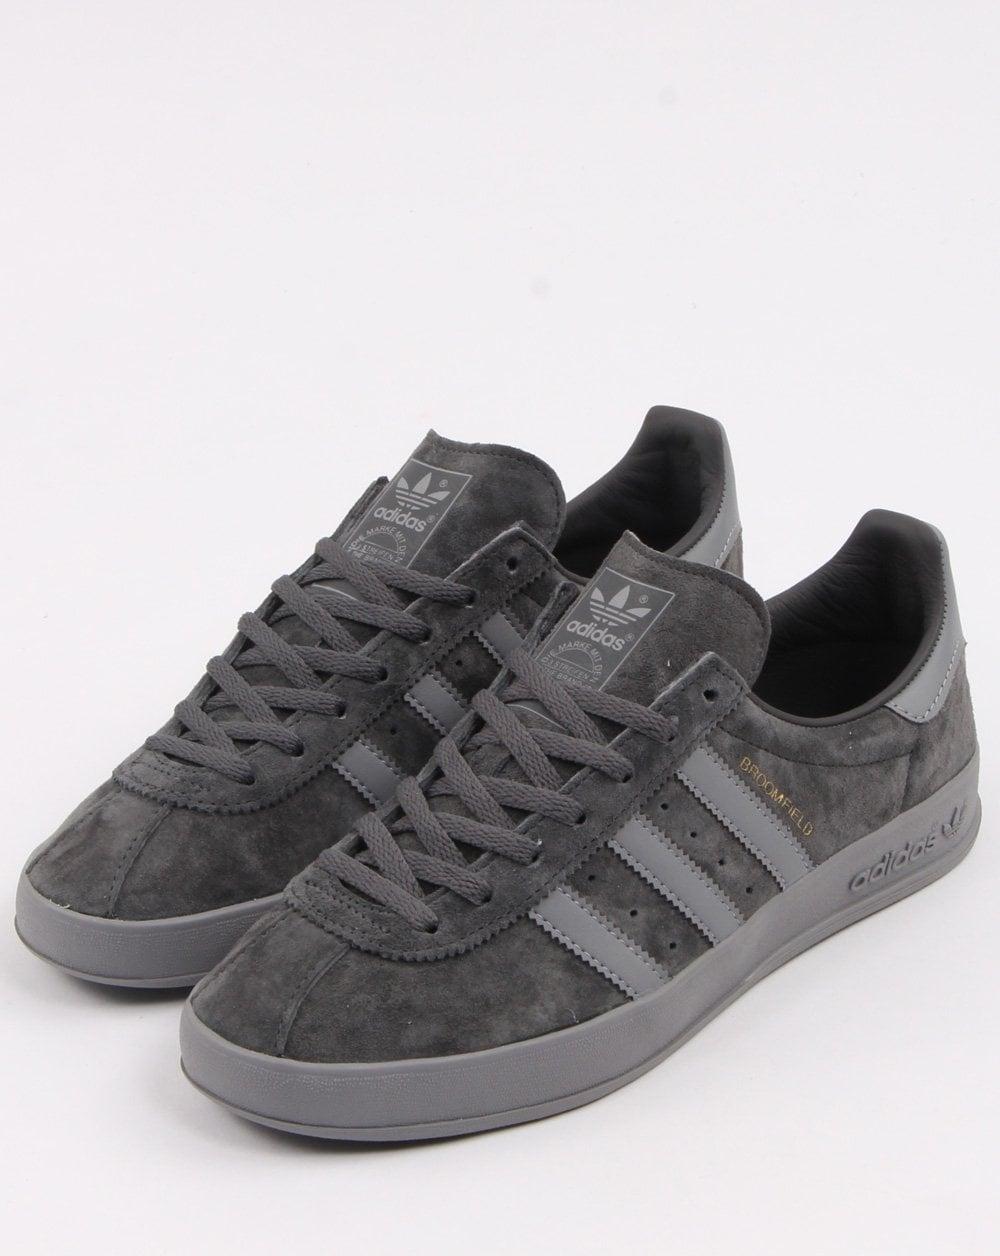 Adidas Broomfield Trainers Grey